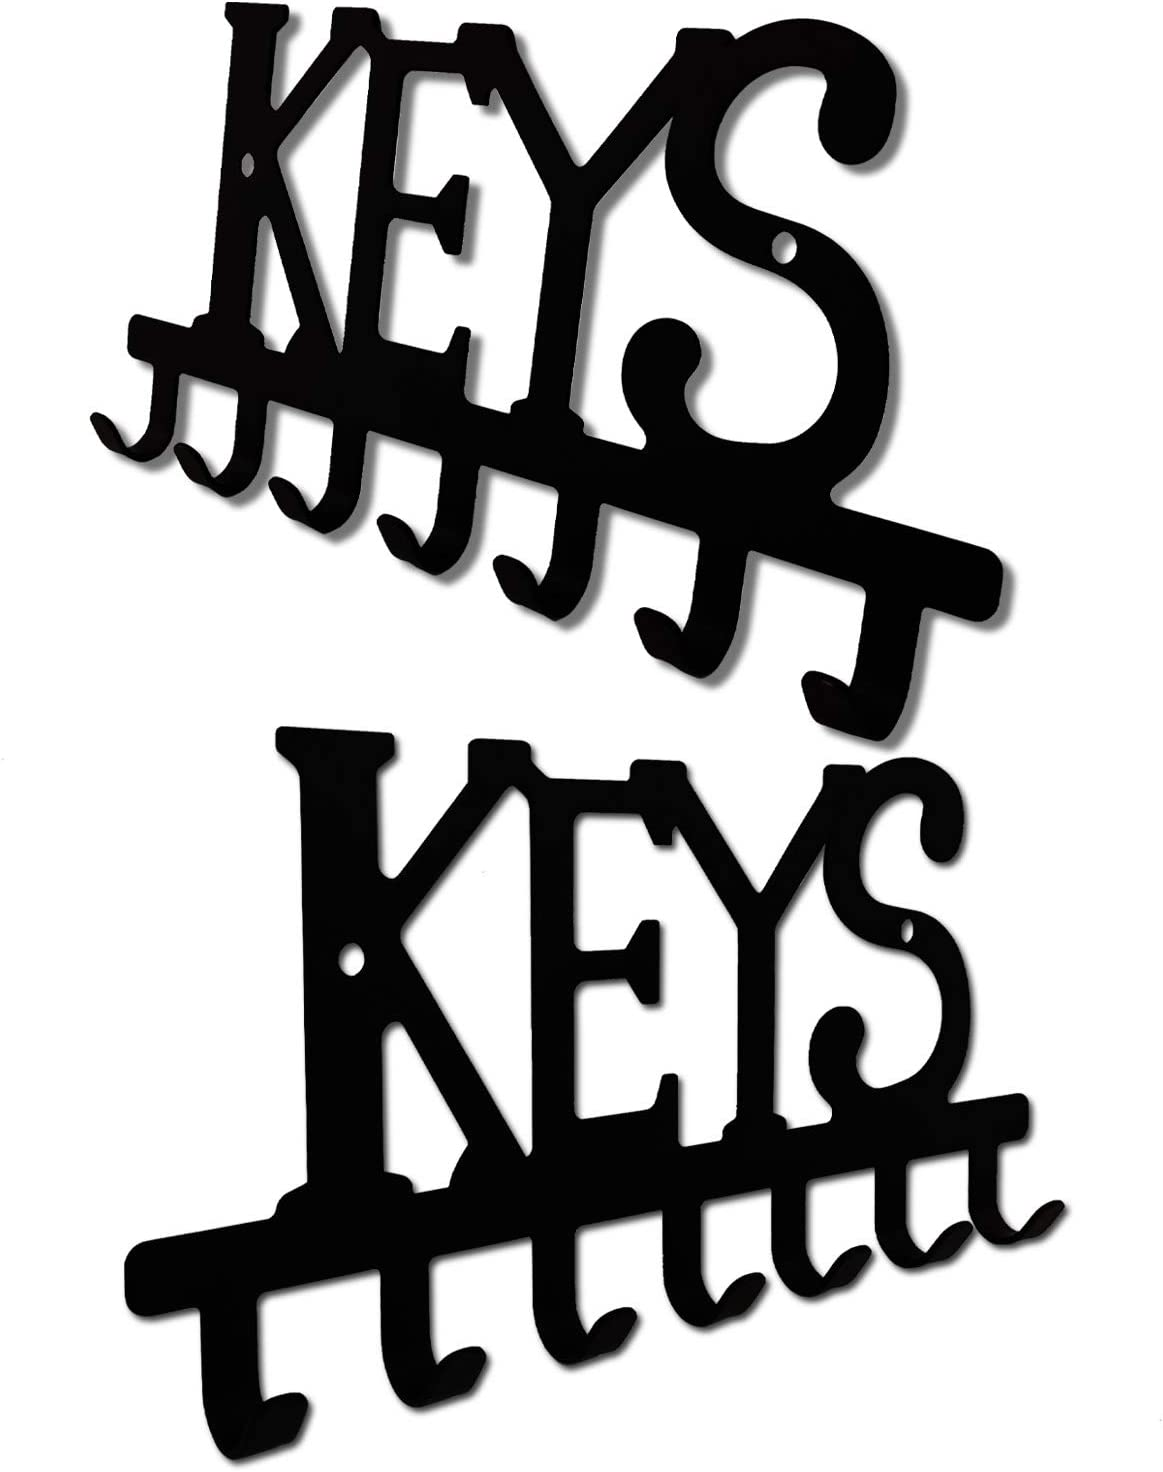 Kitchen,or Garage Store House 2 Pc Set Key Holder Wall Keys Hooks Racks Wall Mount Metal Organizer Home Decor Key Hanger Decorative with 4 Hooks for Front Door